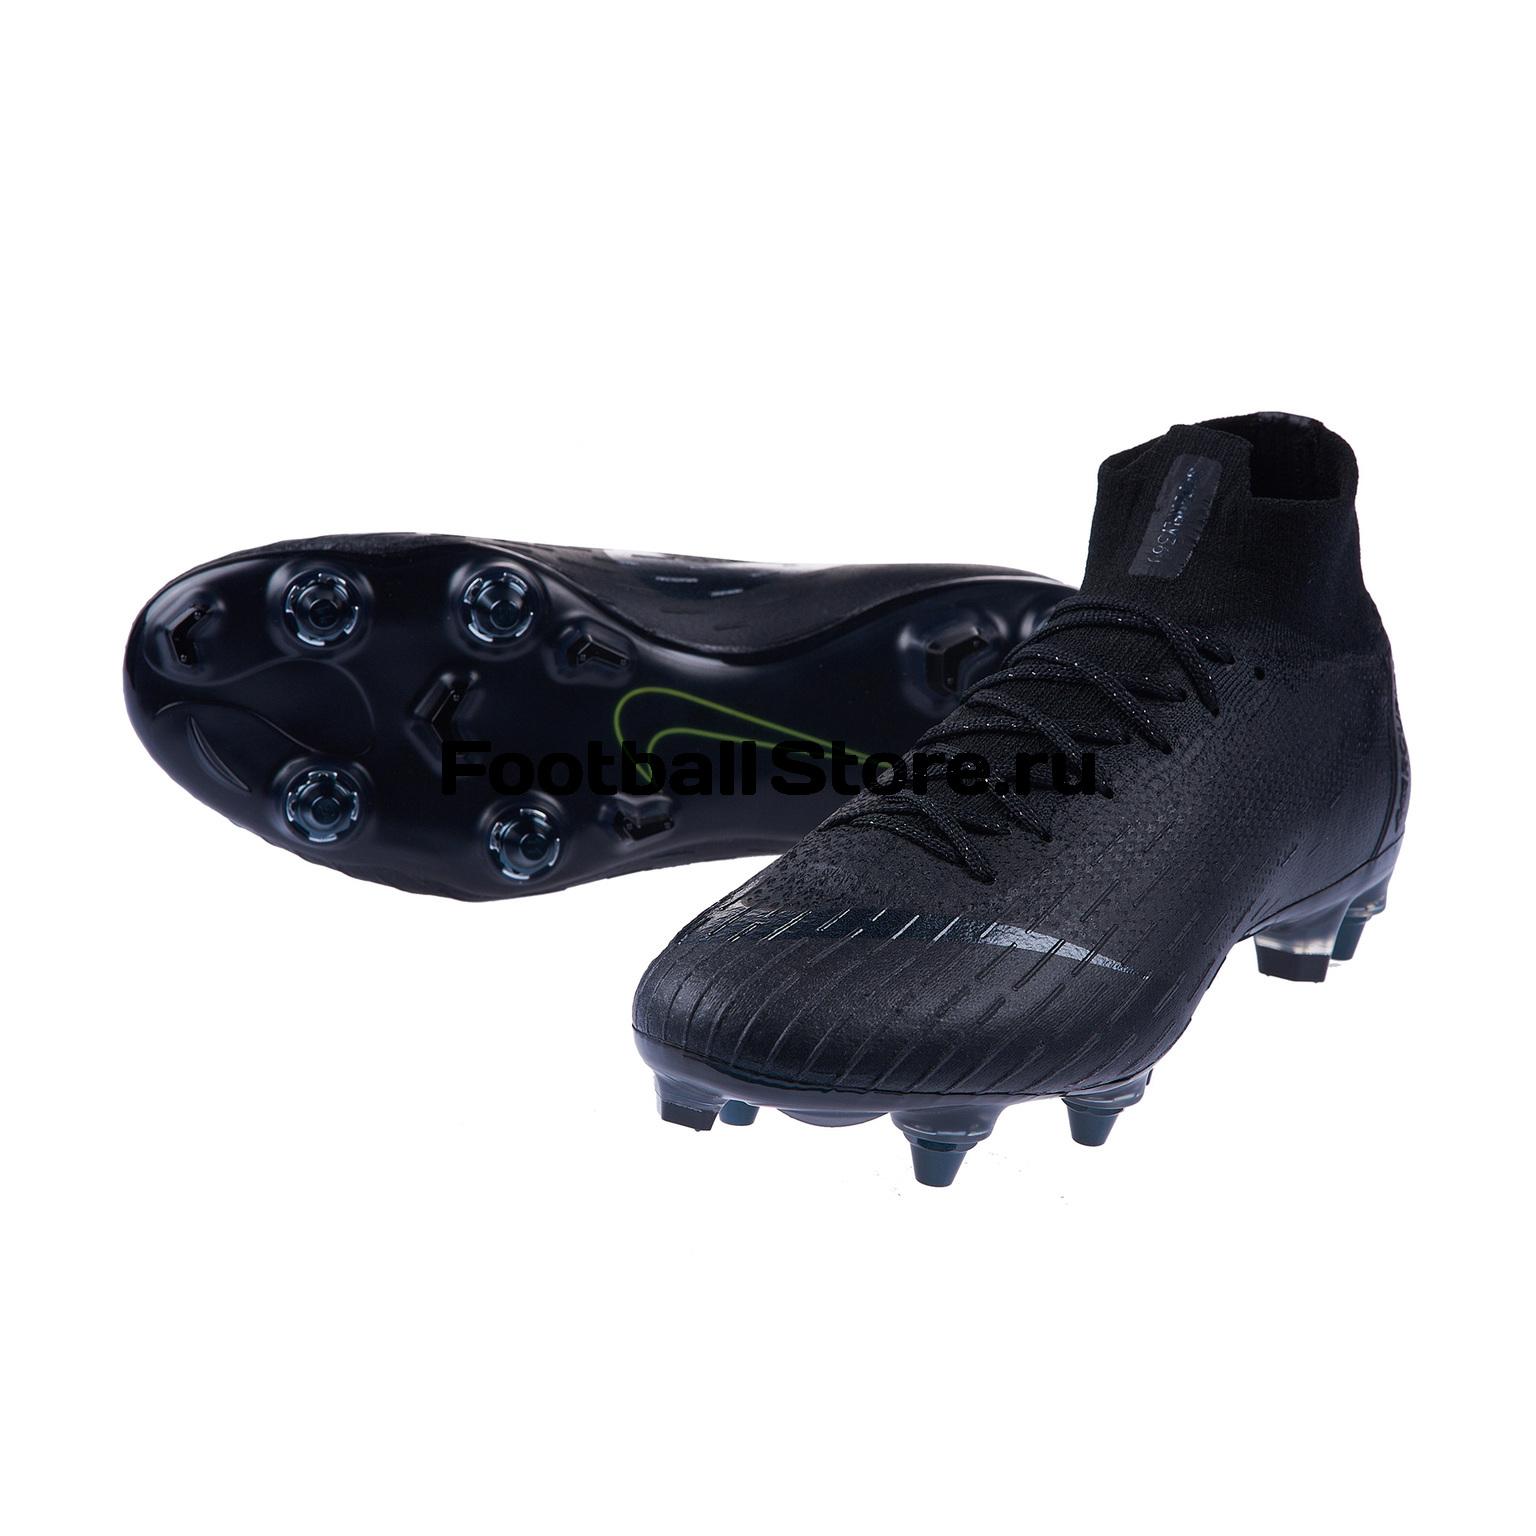 Бутсы Nike Superfly 6 Elite SG-Pro AC AH7366-001 цена и фото